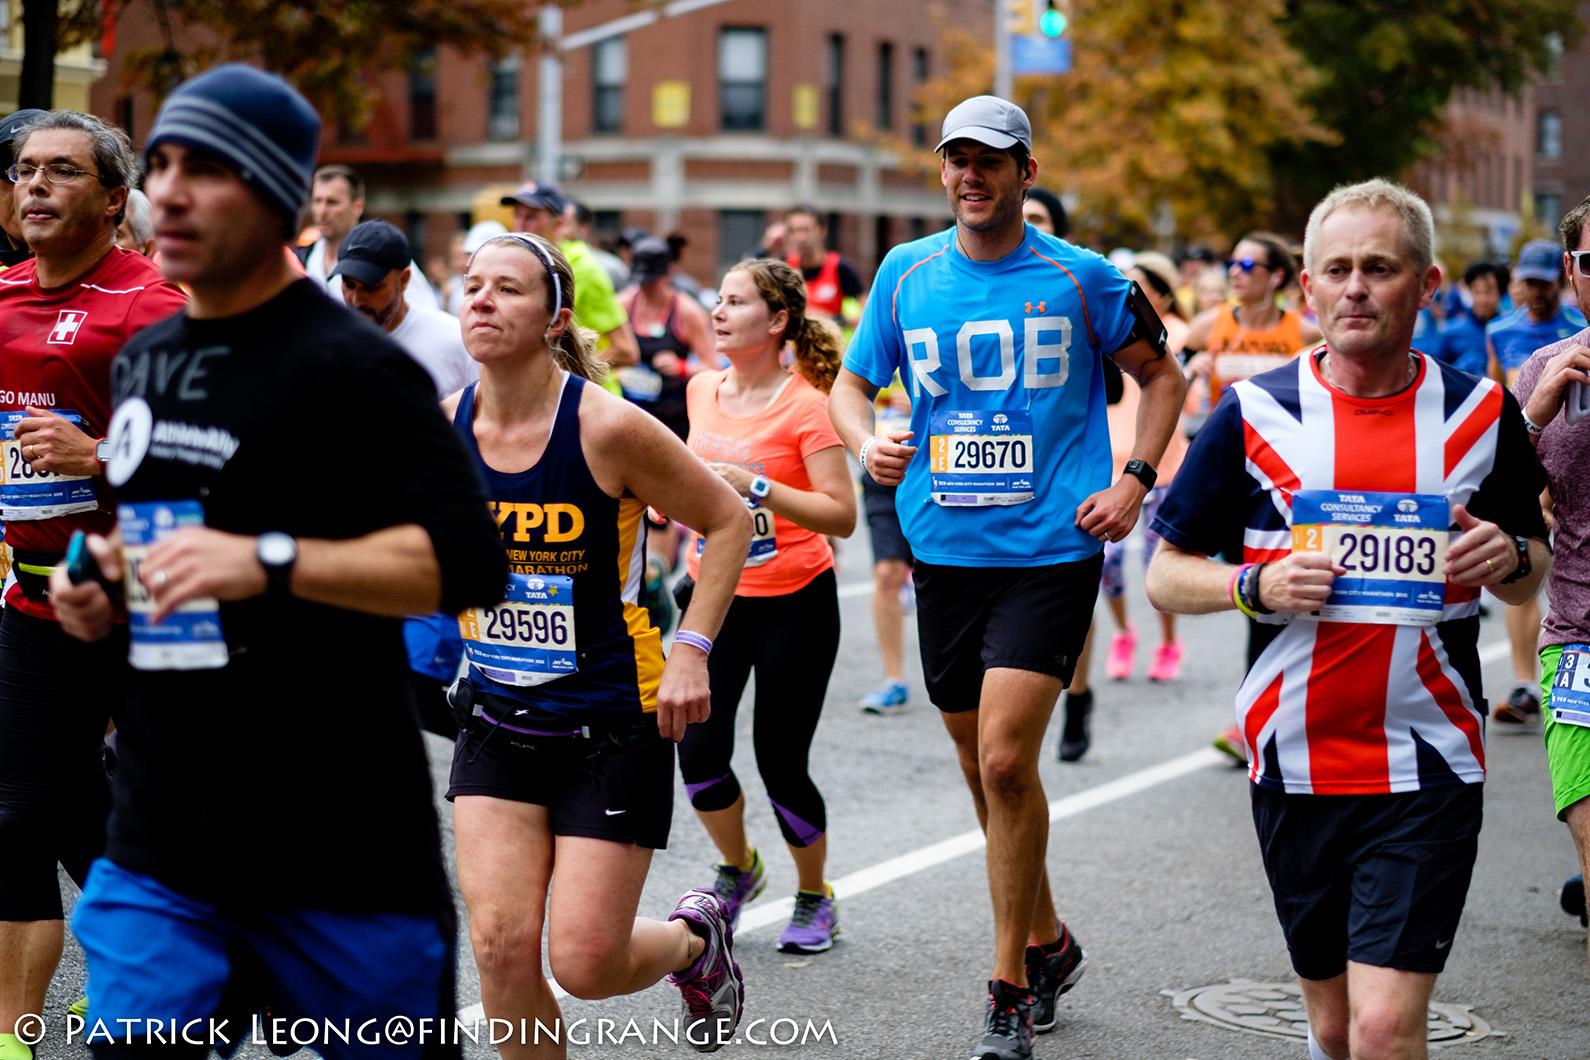 NYC-Marathon-Brooklyn-Bay-Ridge-Fuji-X-T1-XF-56mm-F1.2-R-APD-Lens-1